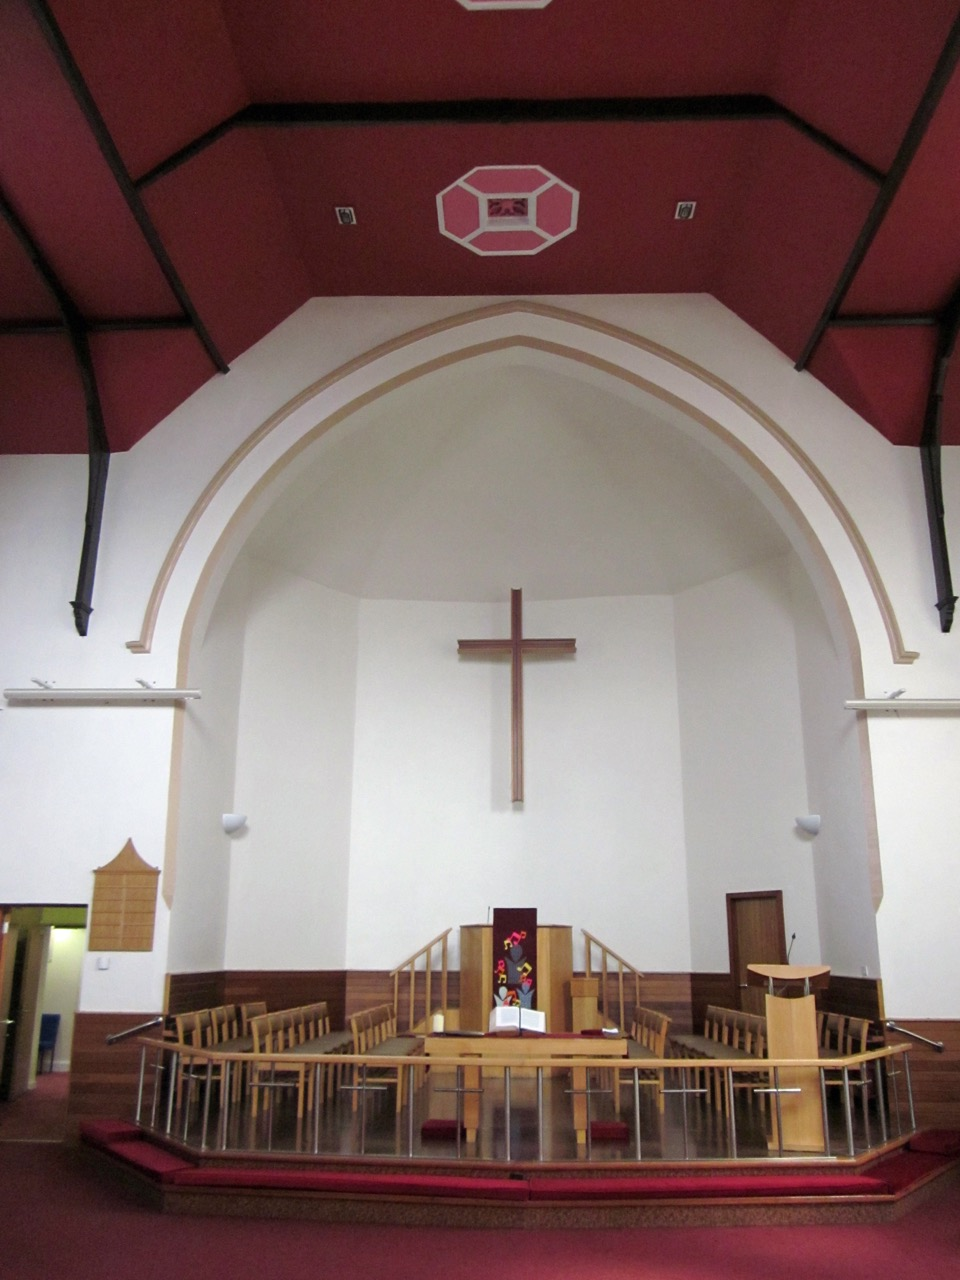 Methodist Church, interior view